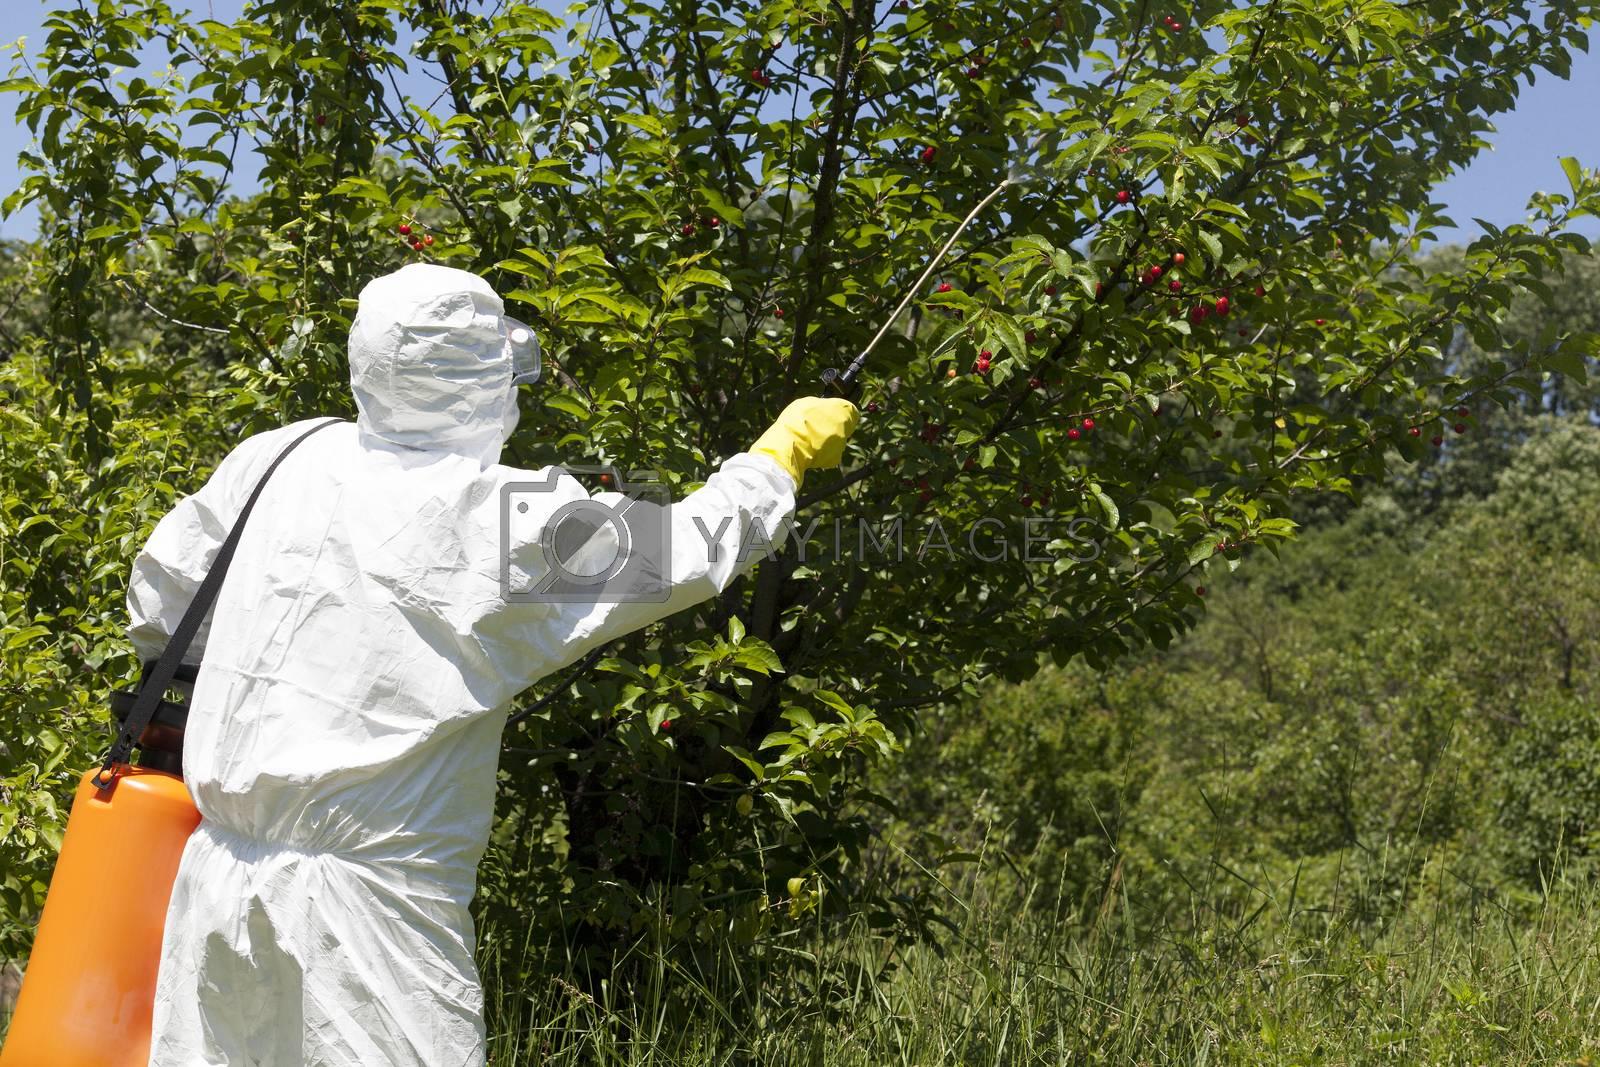 Farmer spraying toxic pesticides. Non-organic fruit.